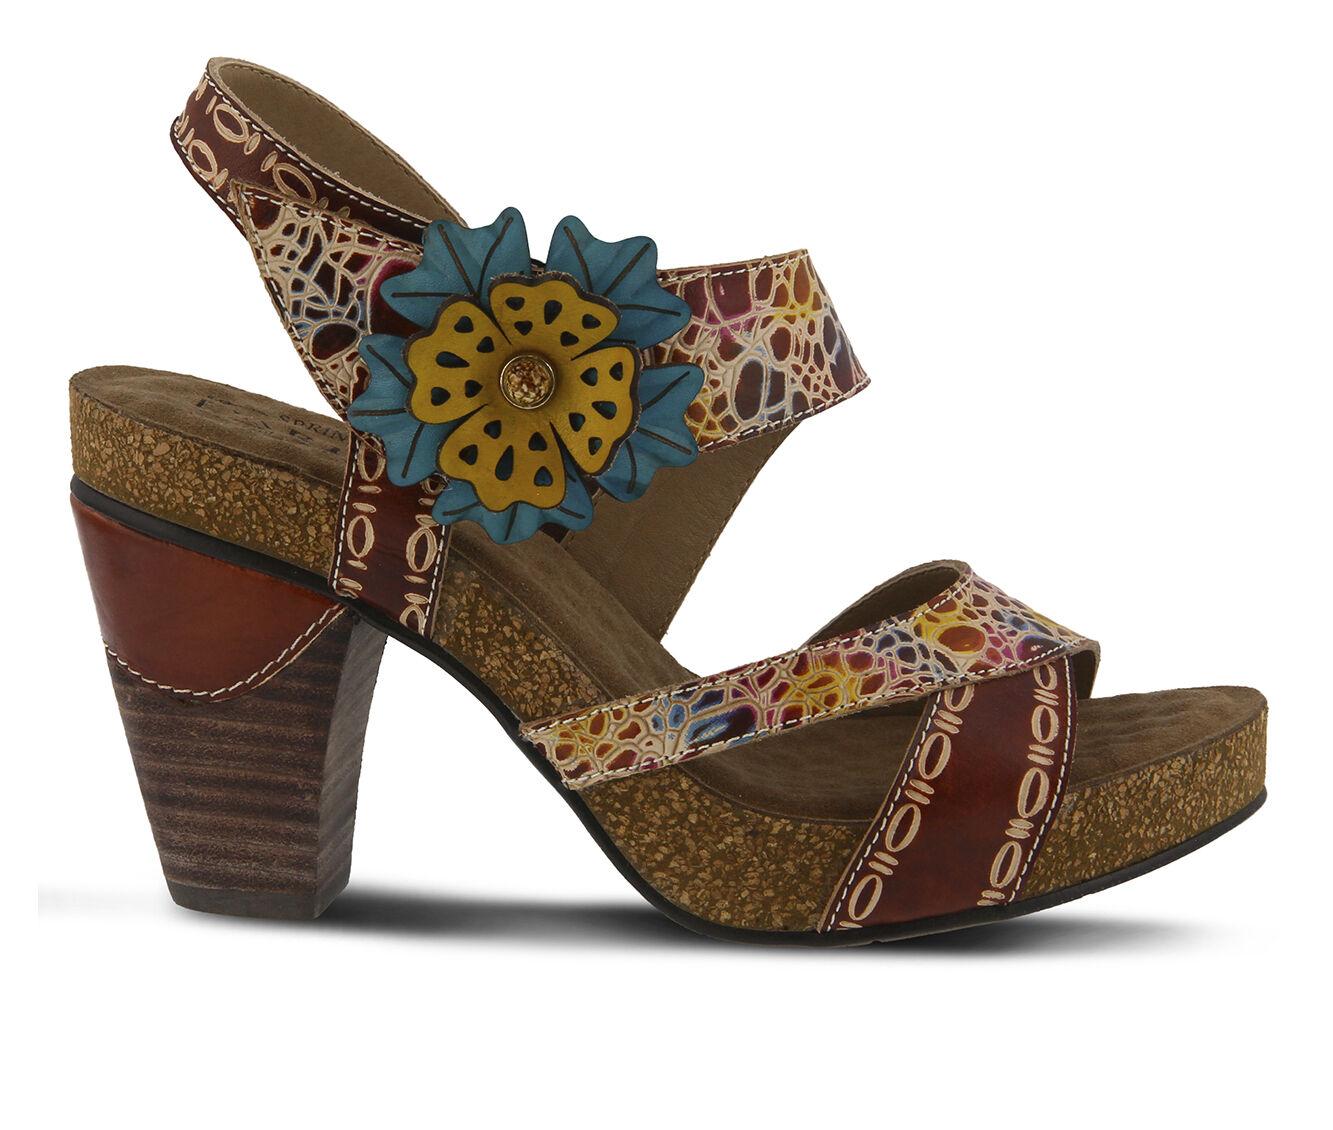 uk shoes_kd6632